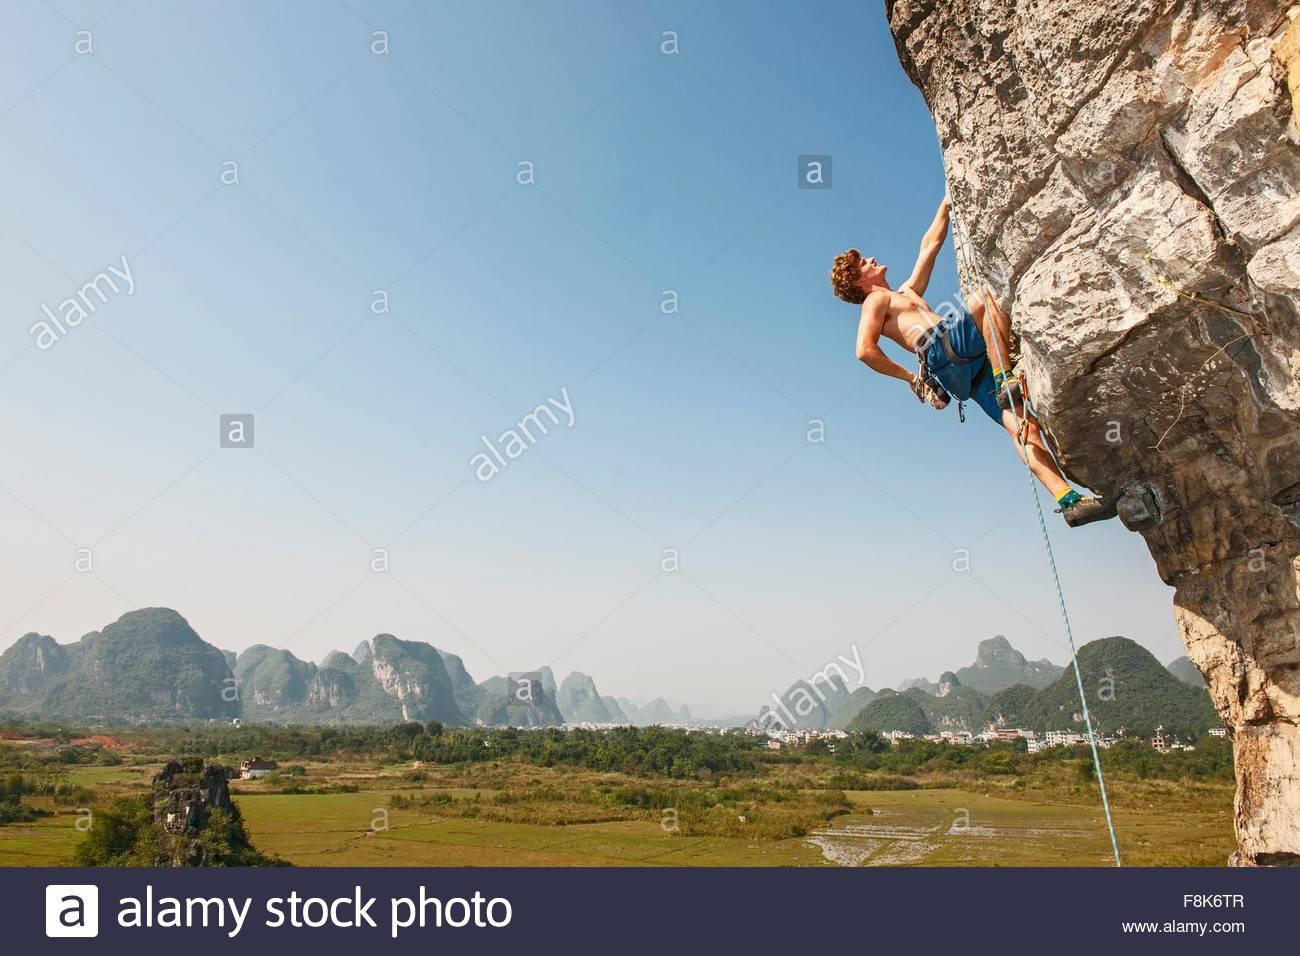 Escalada escalador masculino en el huevo - un acantilado de piedra caliza en Yangshuo, Guangxi Zhuang, China Imagen De Stock